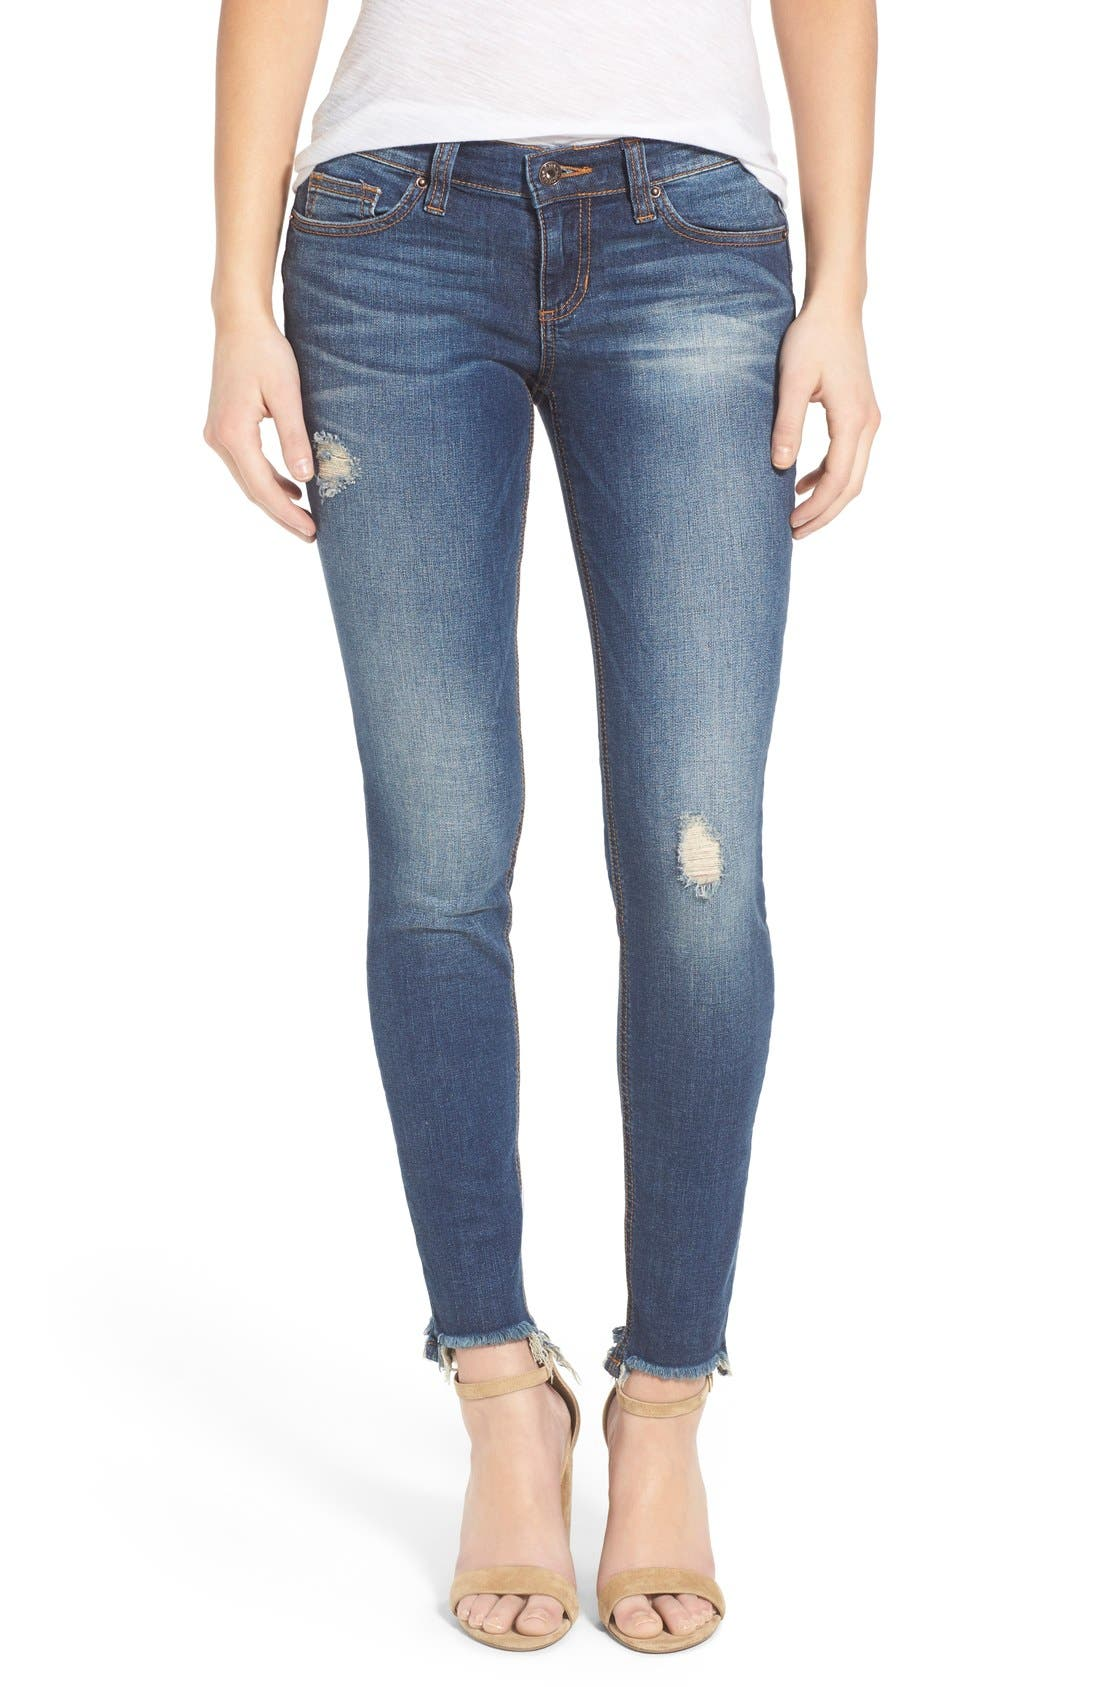 Alternate Image 1 Selected - SP Black Distressed Raw Hem Skinny Jeans